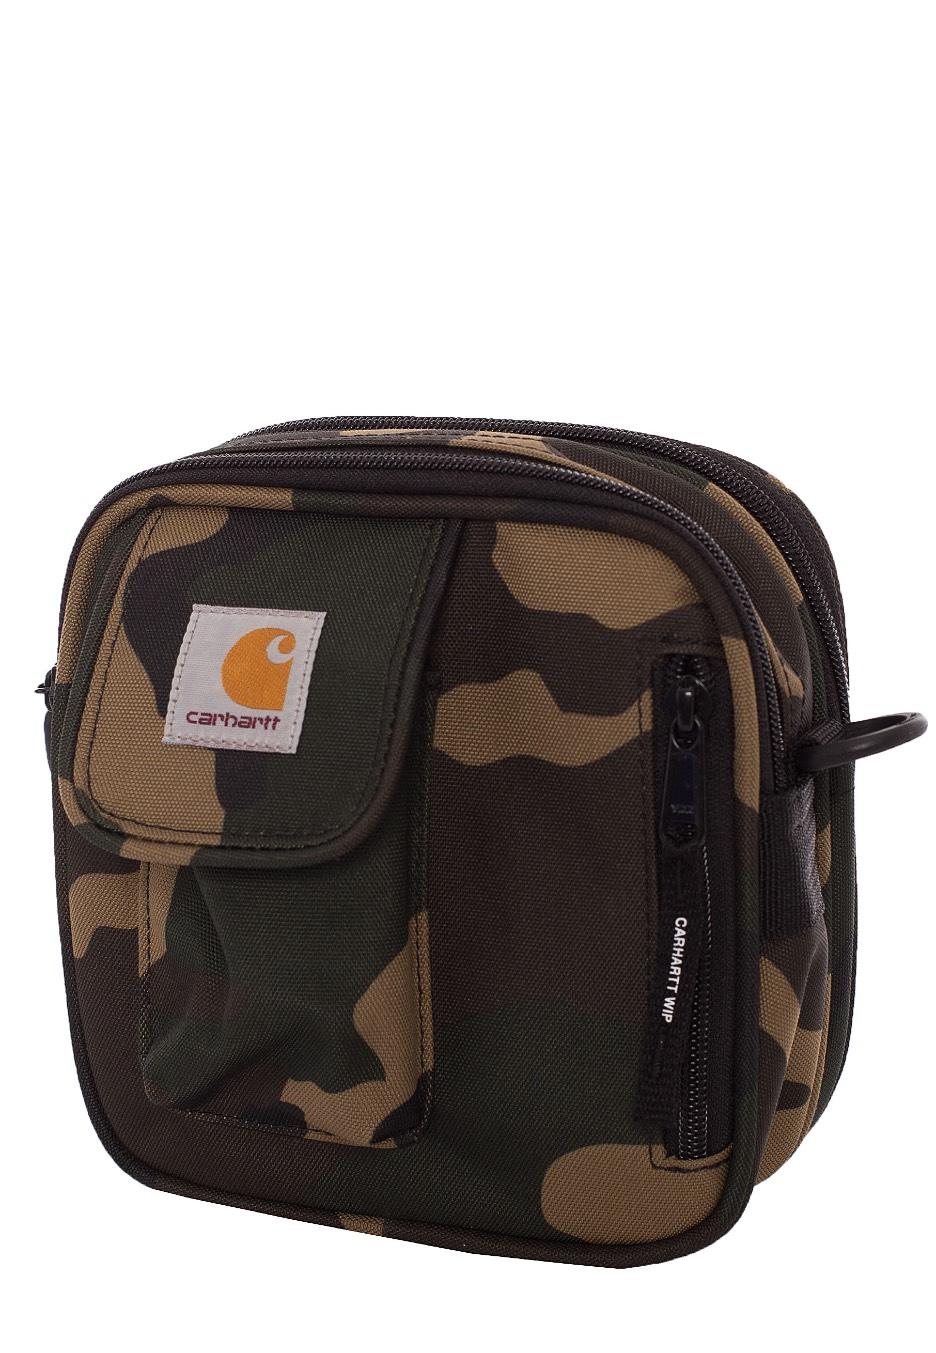 Carhartt WIP - Essentials Duck Camo Laurel - Bag - Streetwear Shop -  Impericon.com Worldwide